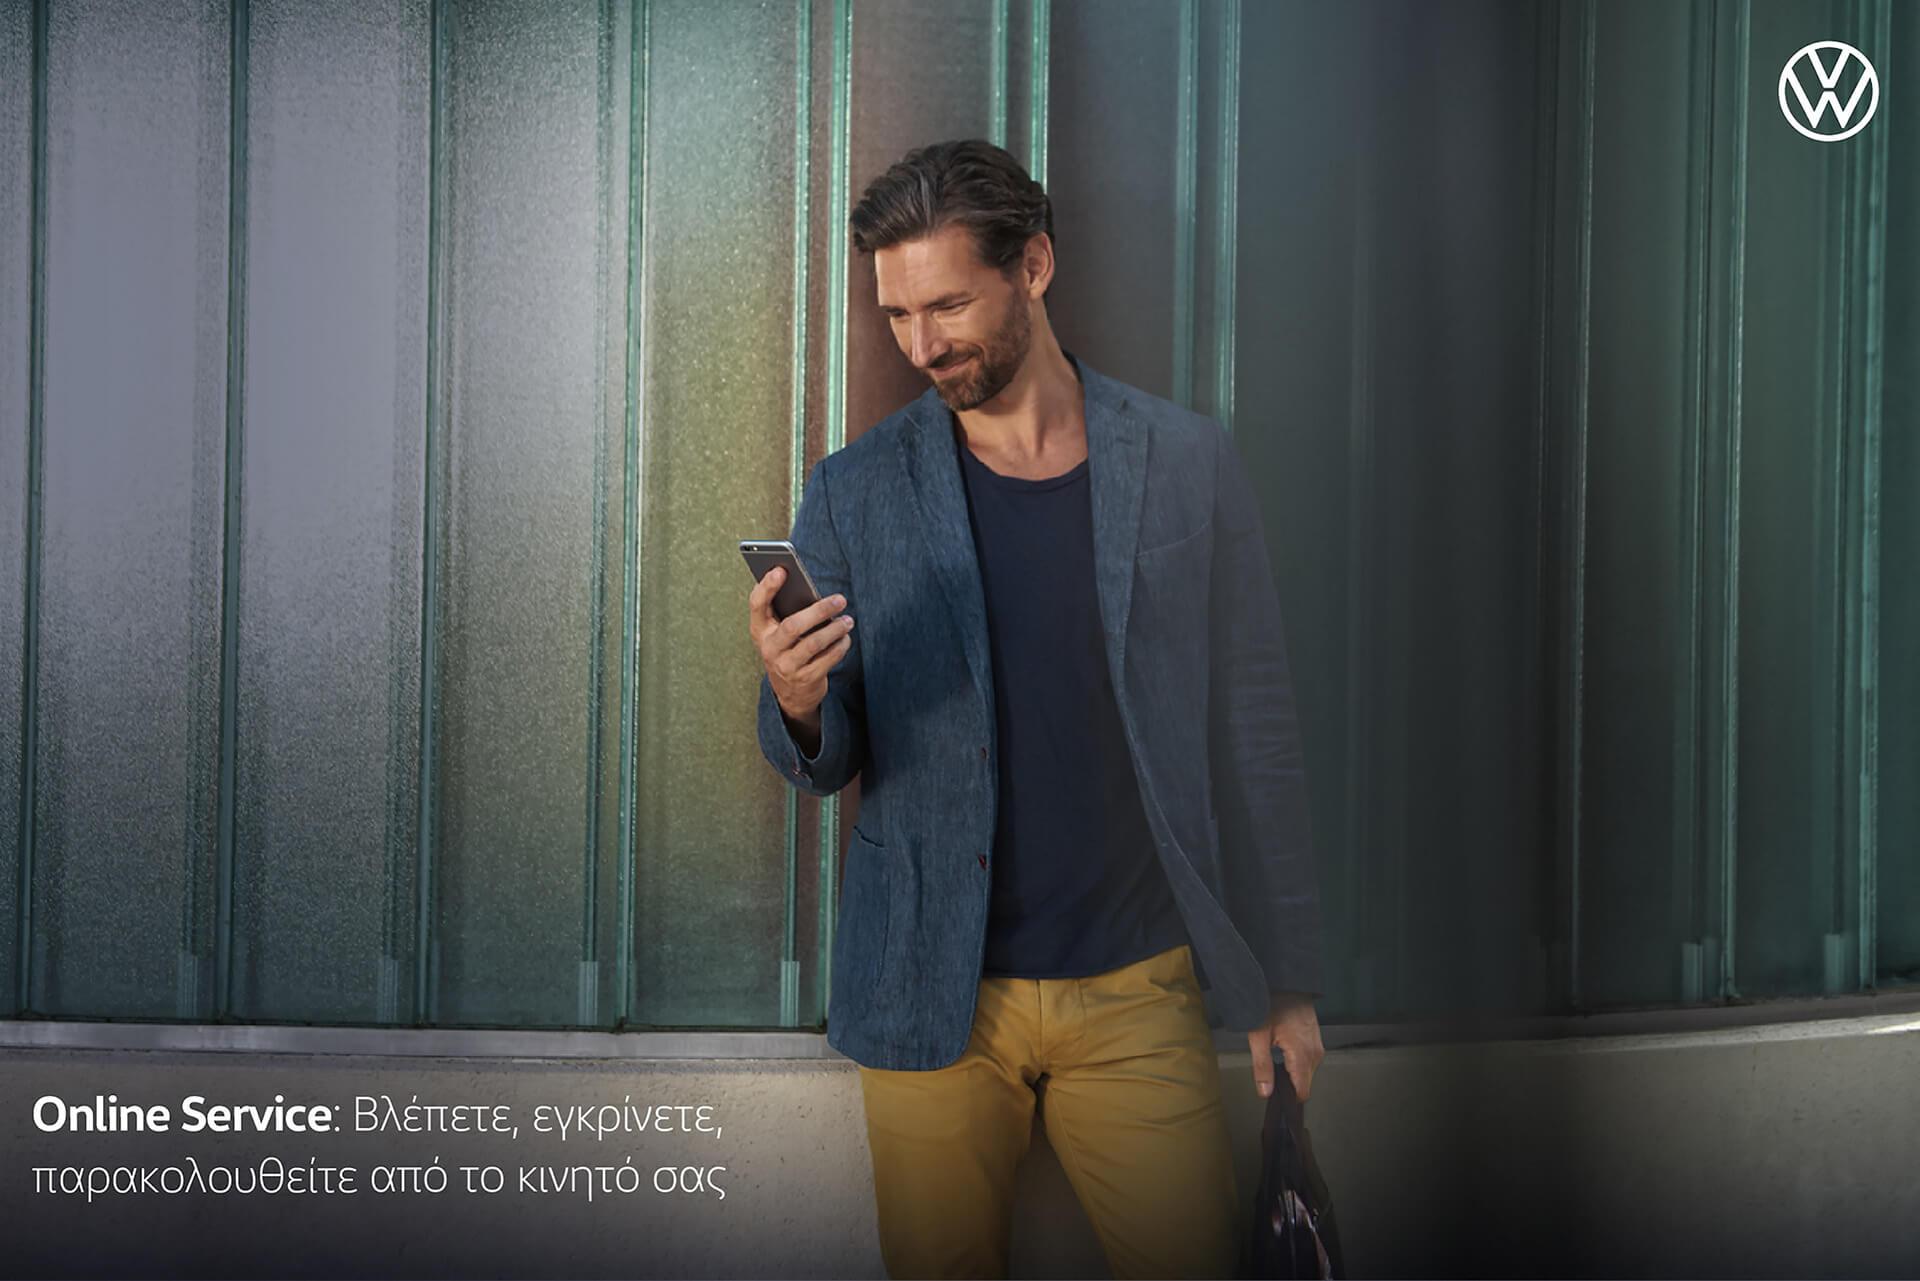 Volkswagen After Sales - Online Service - Παρακολουθείτε το service από το κινητό σας